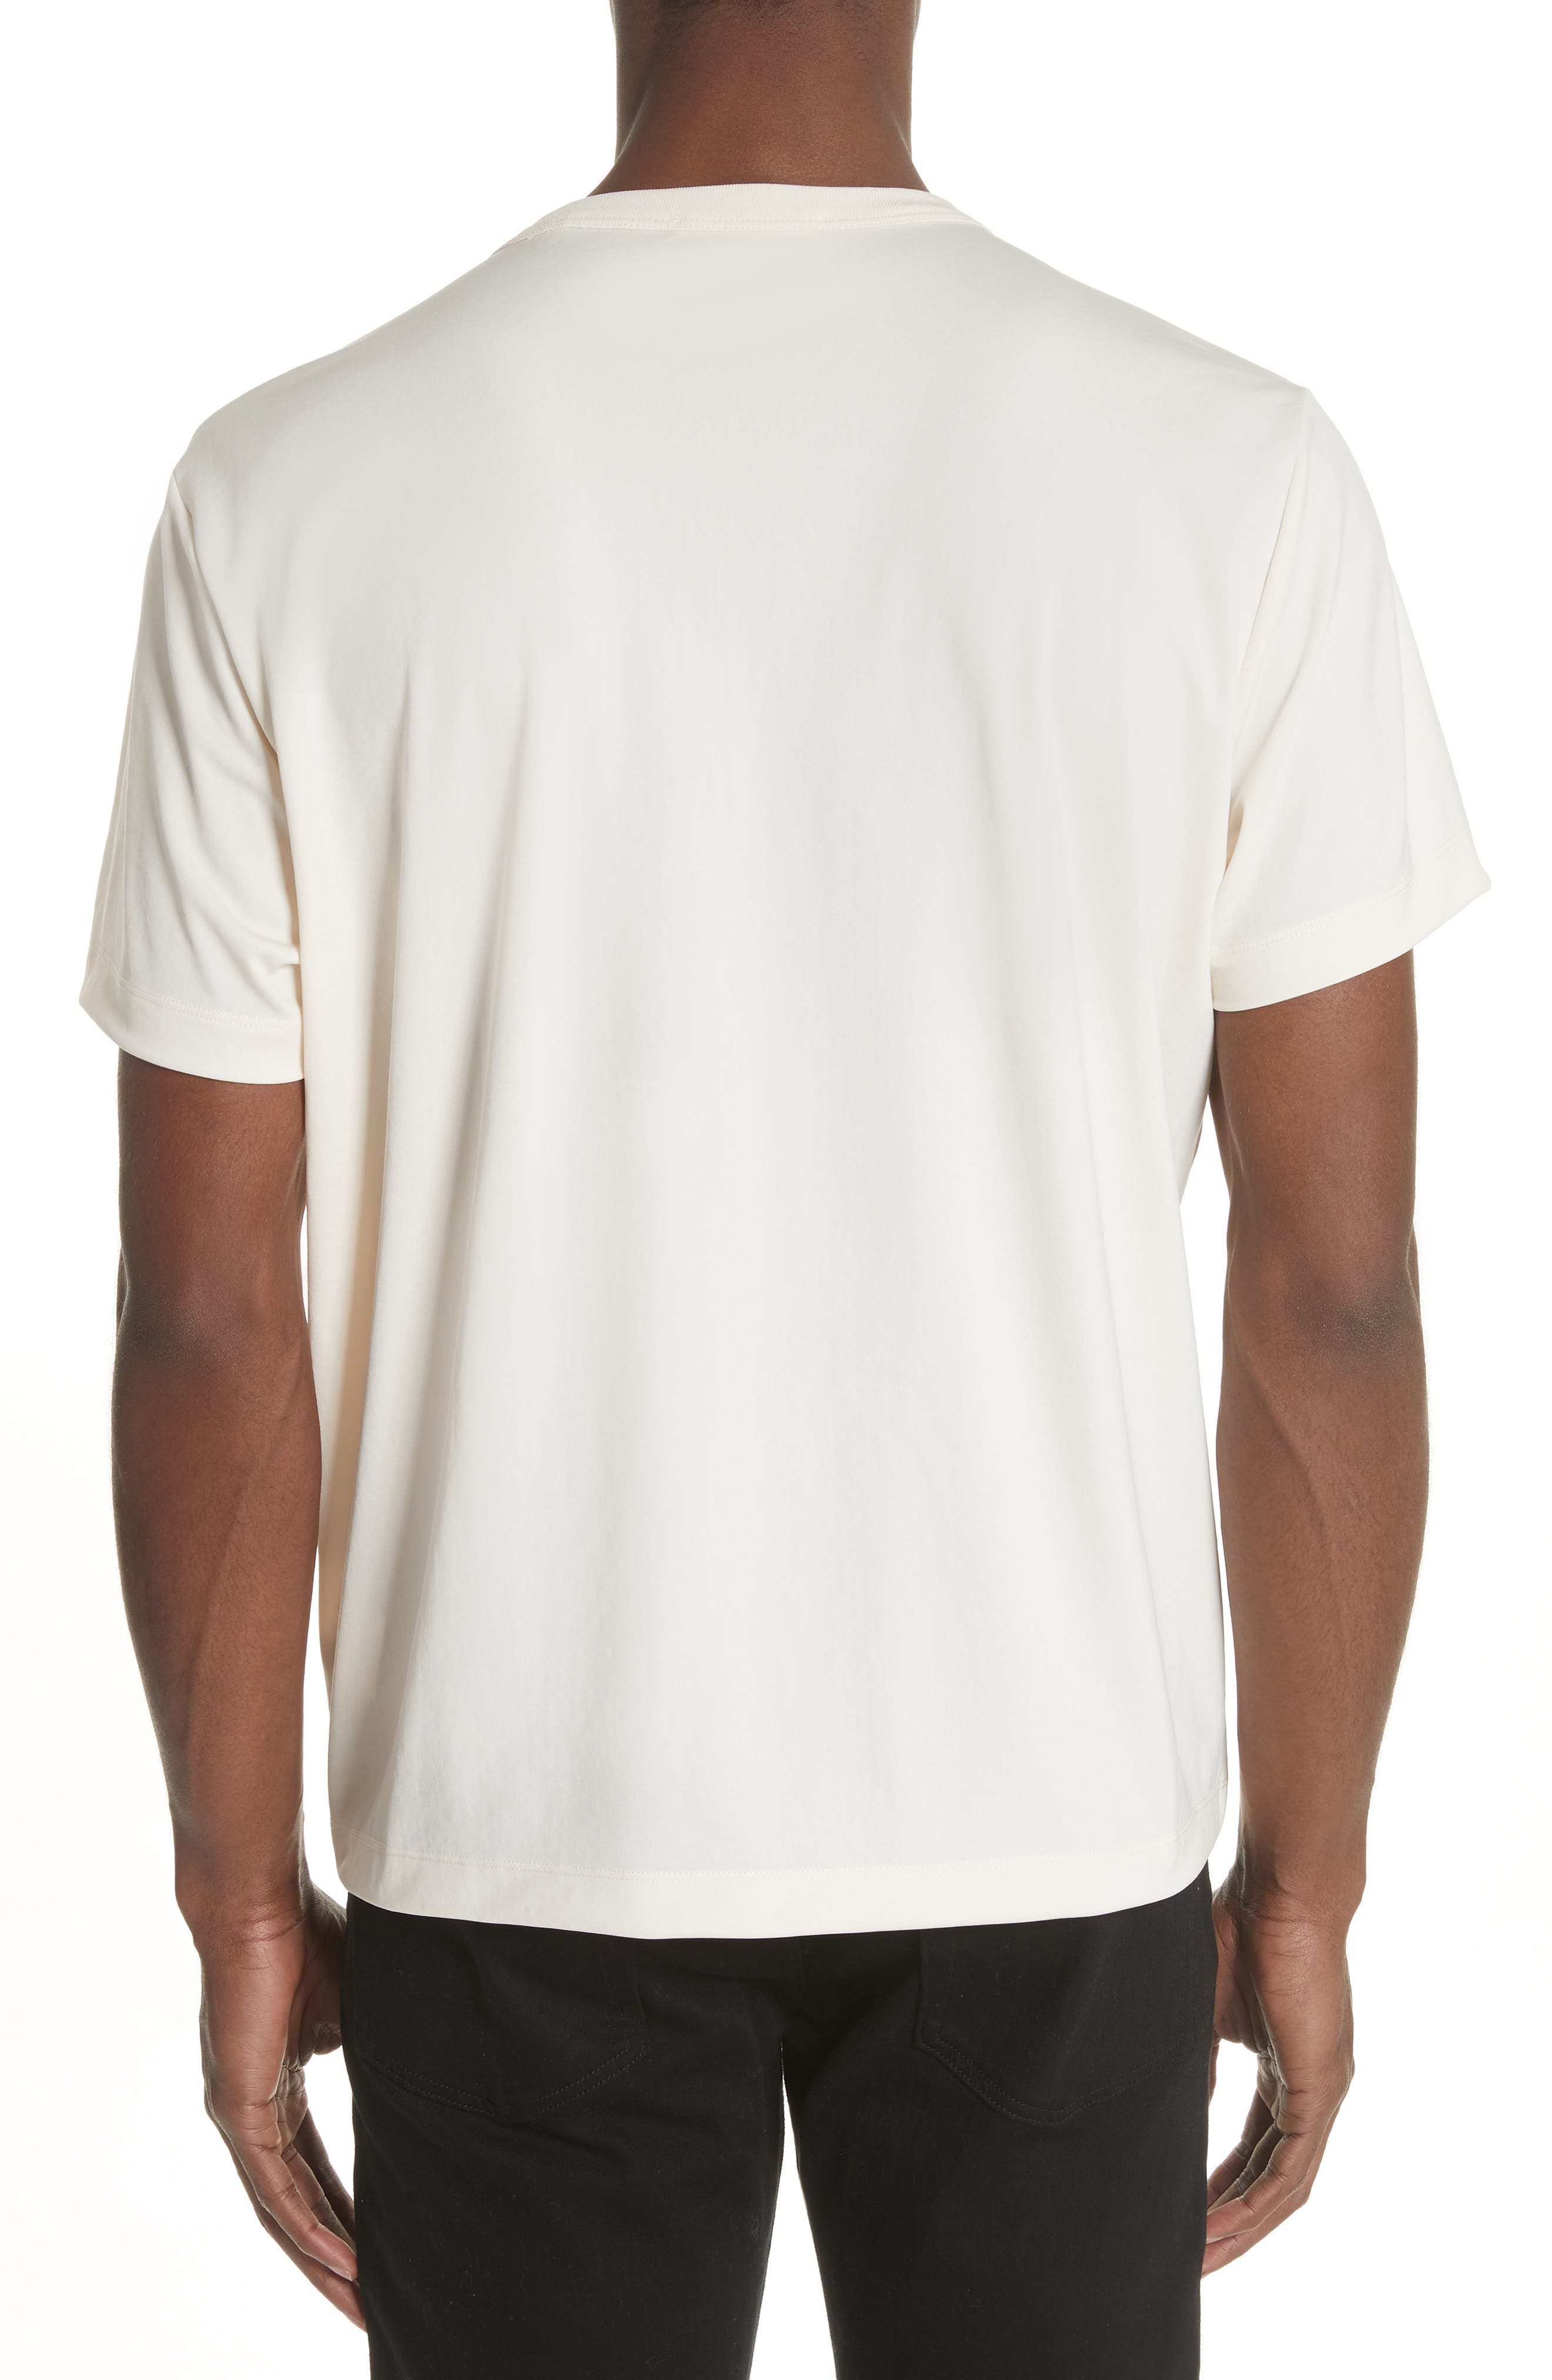 Trademark Graphic T-Shirt,                             Alternate thumbnail 2, color,                             White